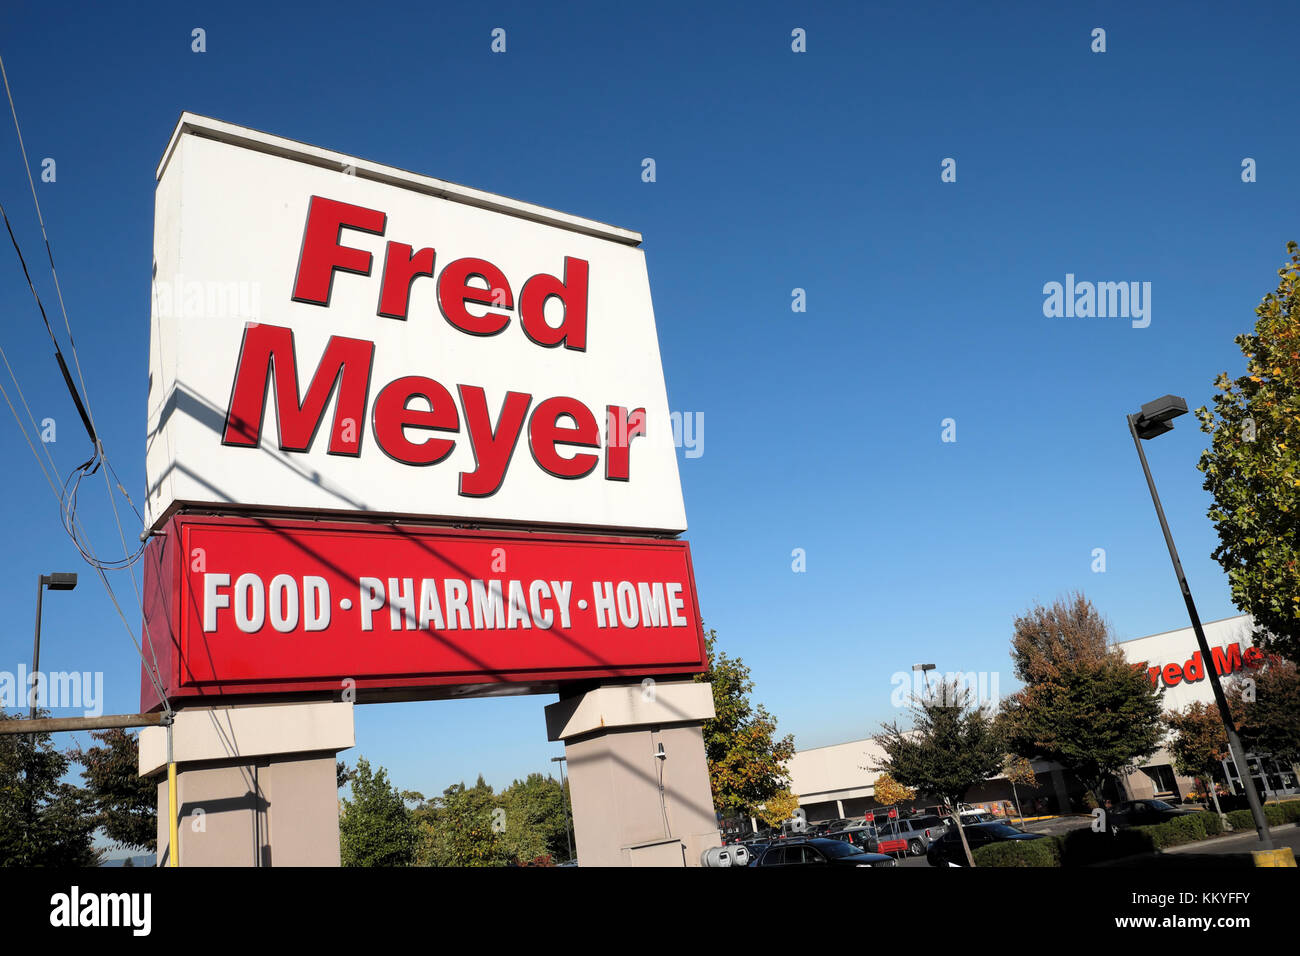 Supermarkets Stock Photos & Supermarkets Stock Images - Alamy